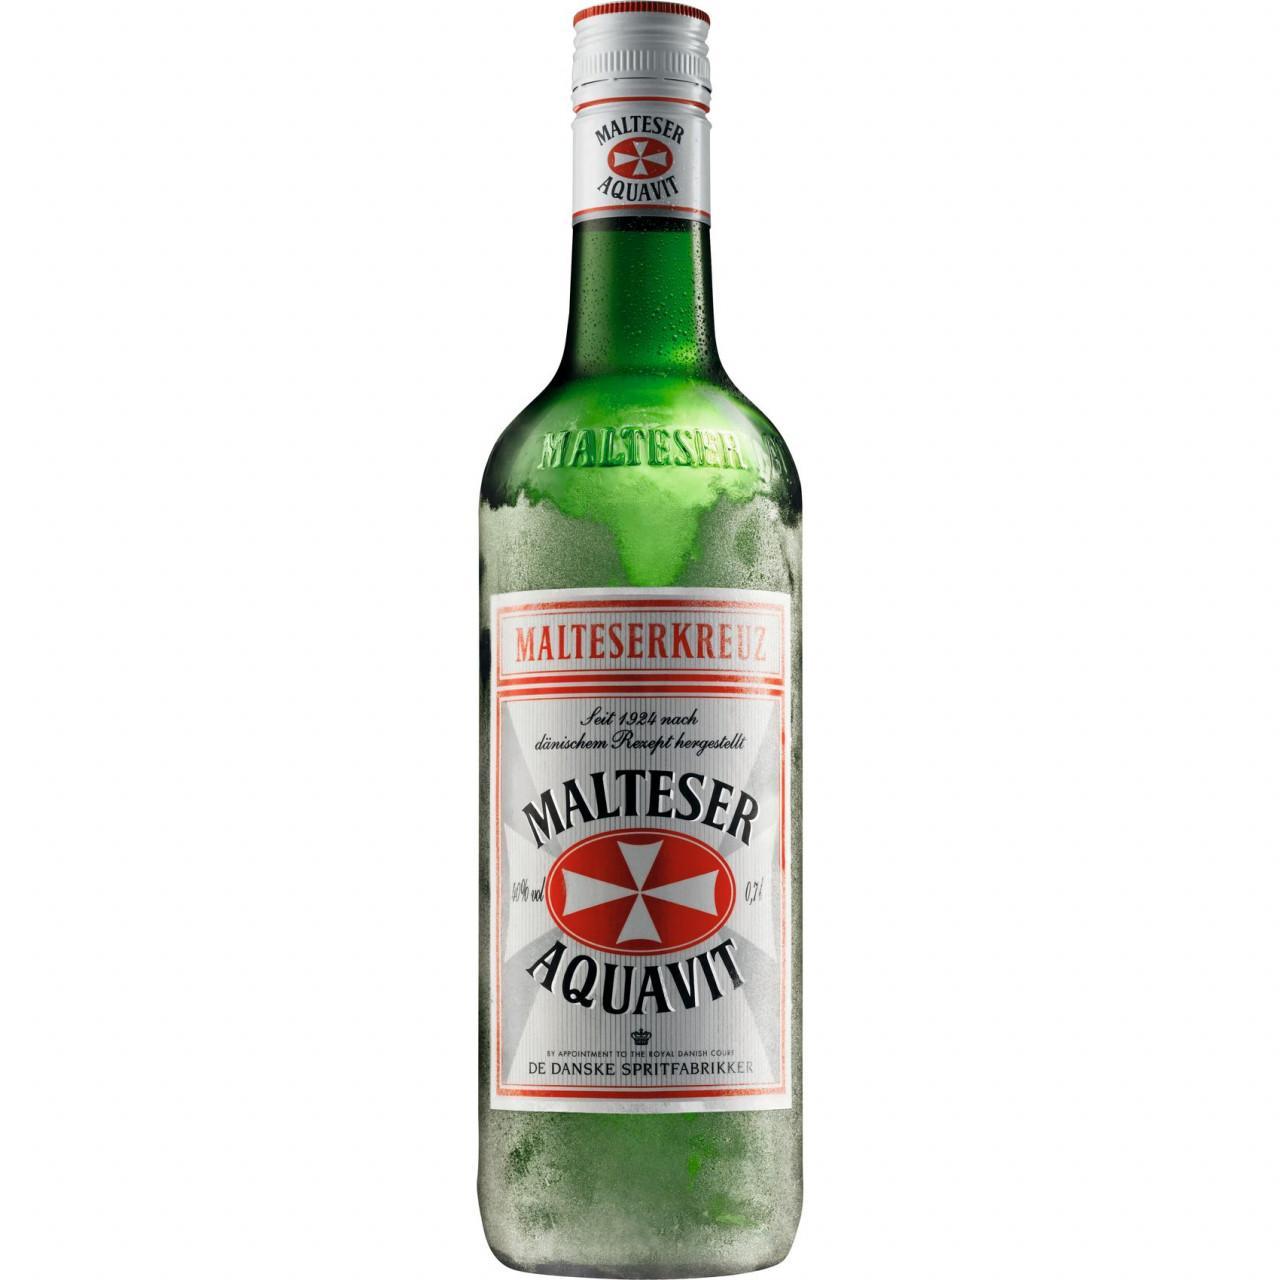 Malteserkreuz Aquavit 40% 0,7l